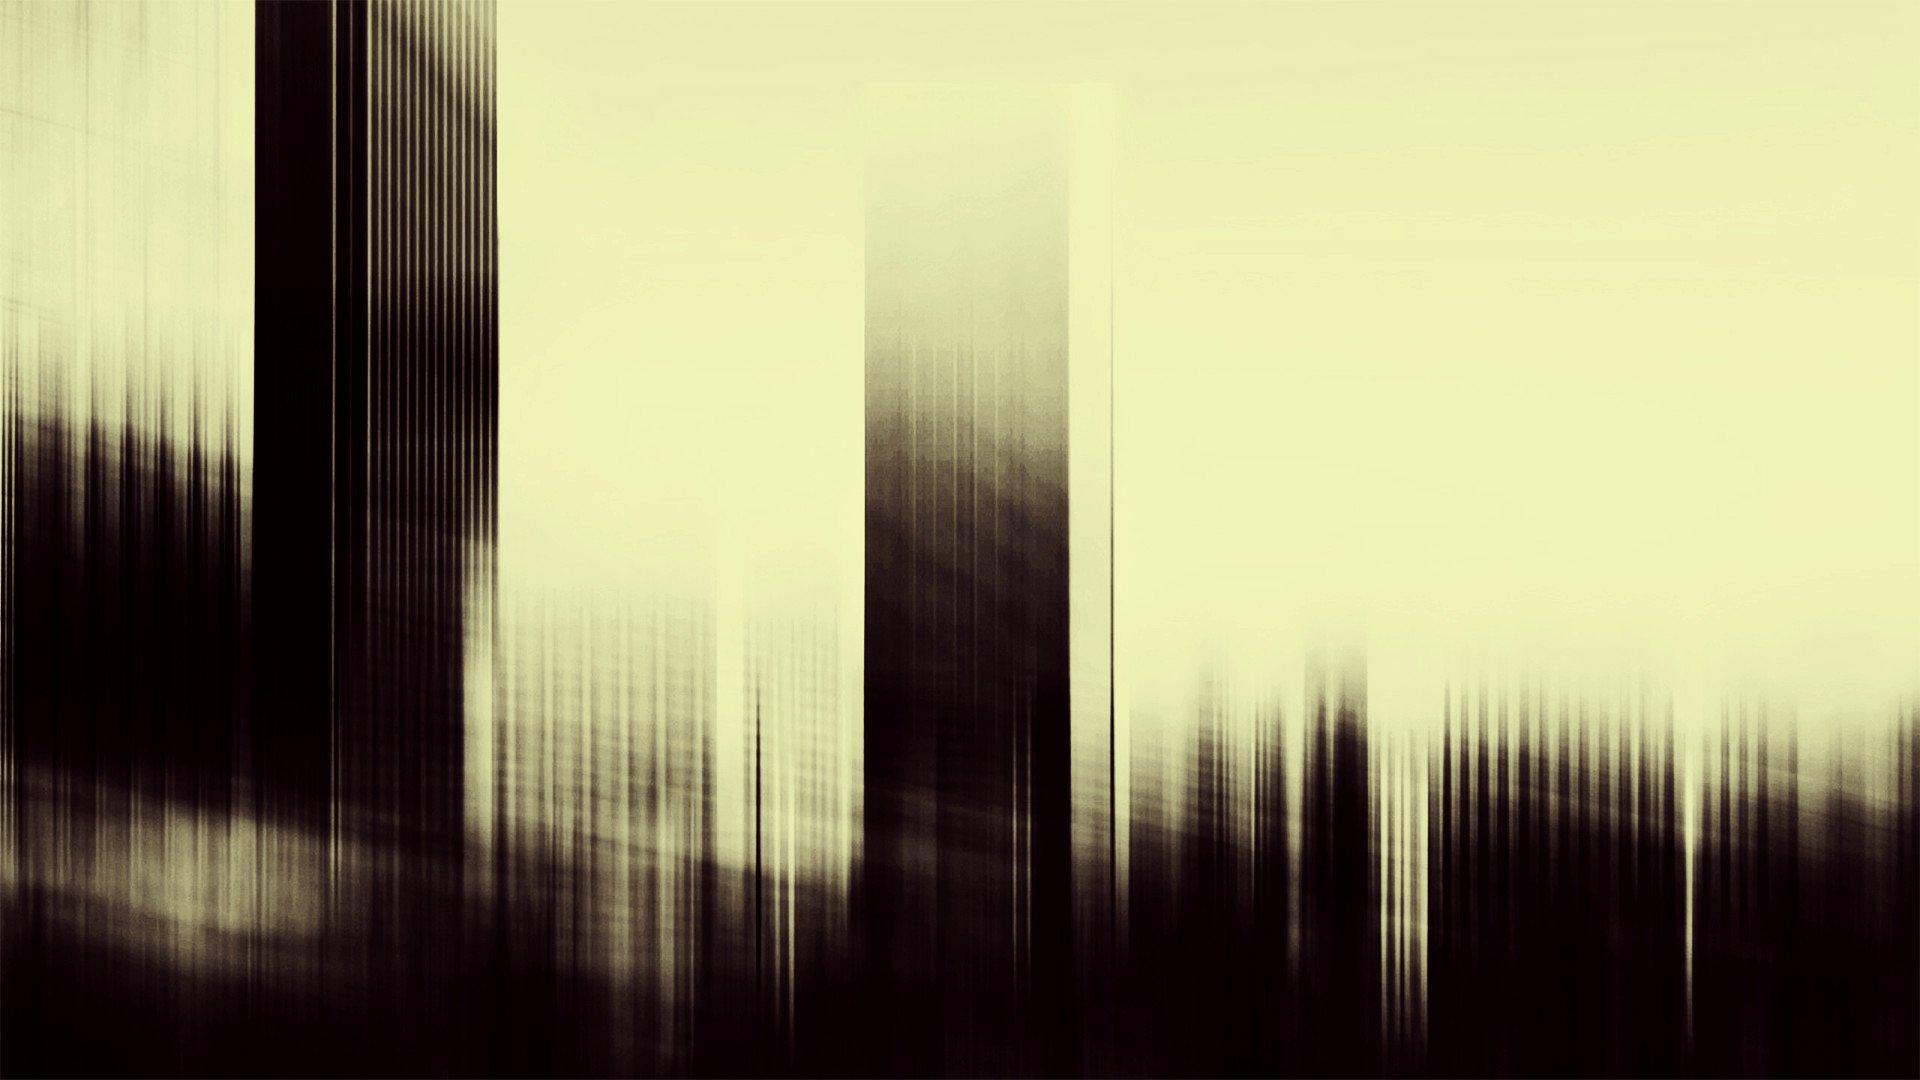 Abstract City 18698 HD wallpaper